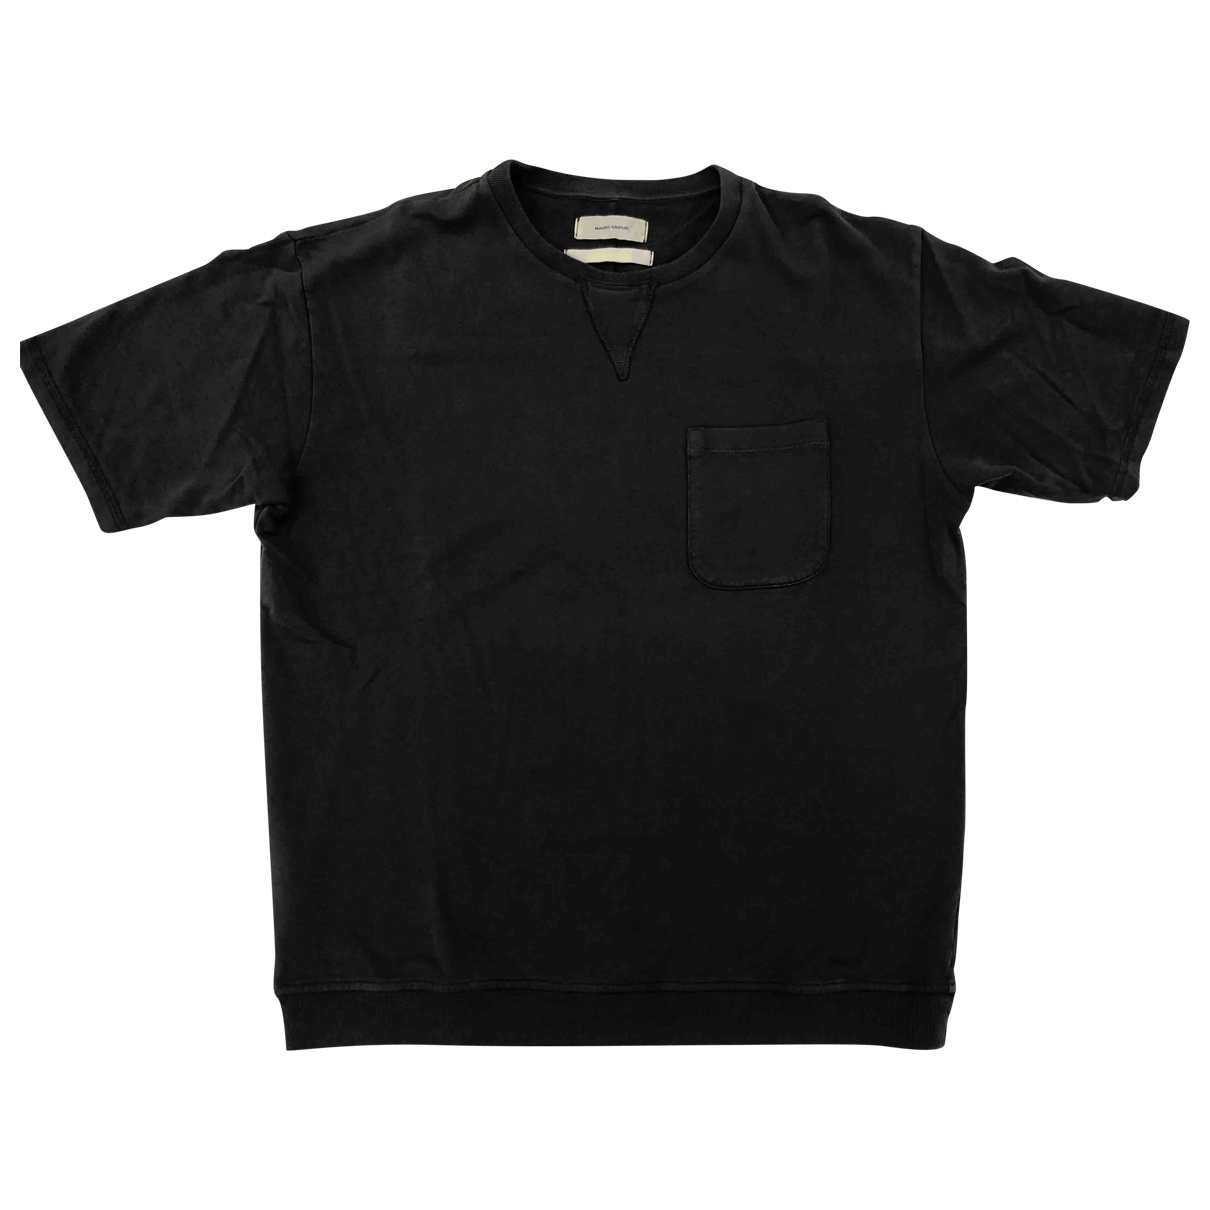 Mauro Grifoni \N Anthracite Cotton Knitwear & Sweatshirts for Men M International